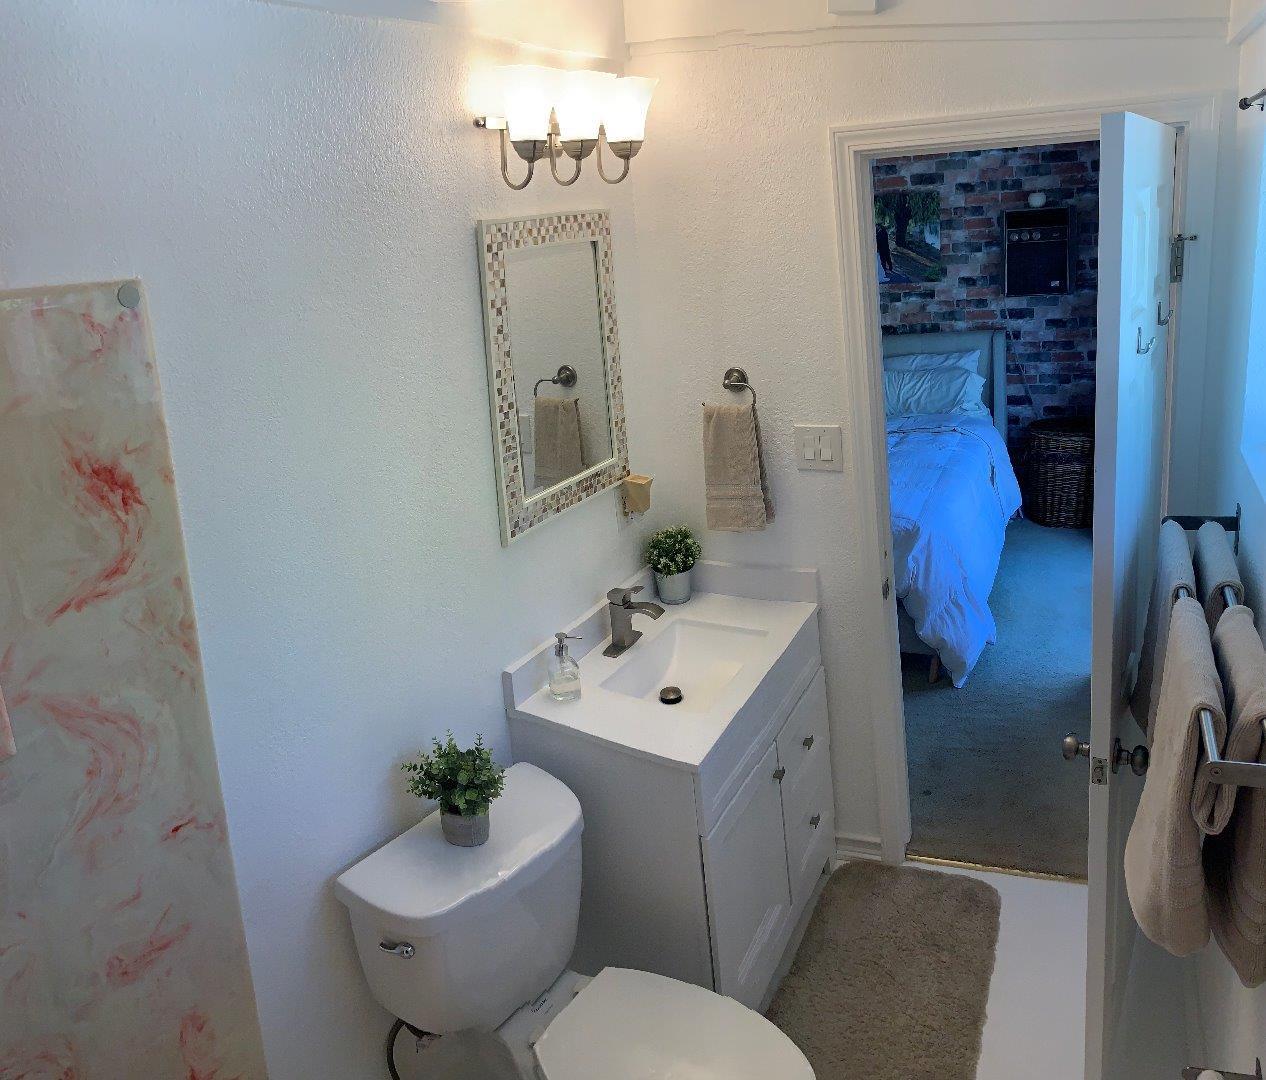 1416 berksford way san jose 95127 j rockcliff realtors. Black Bedroom Furniture Sets. Home Design Ideas